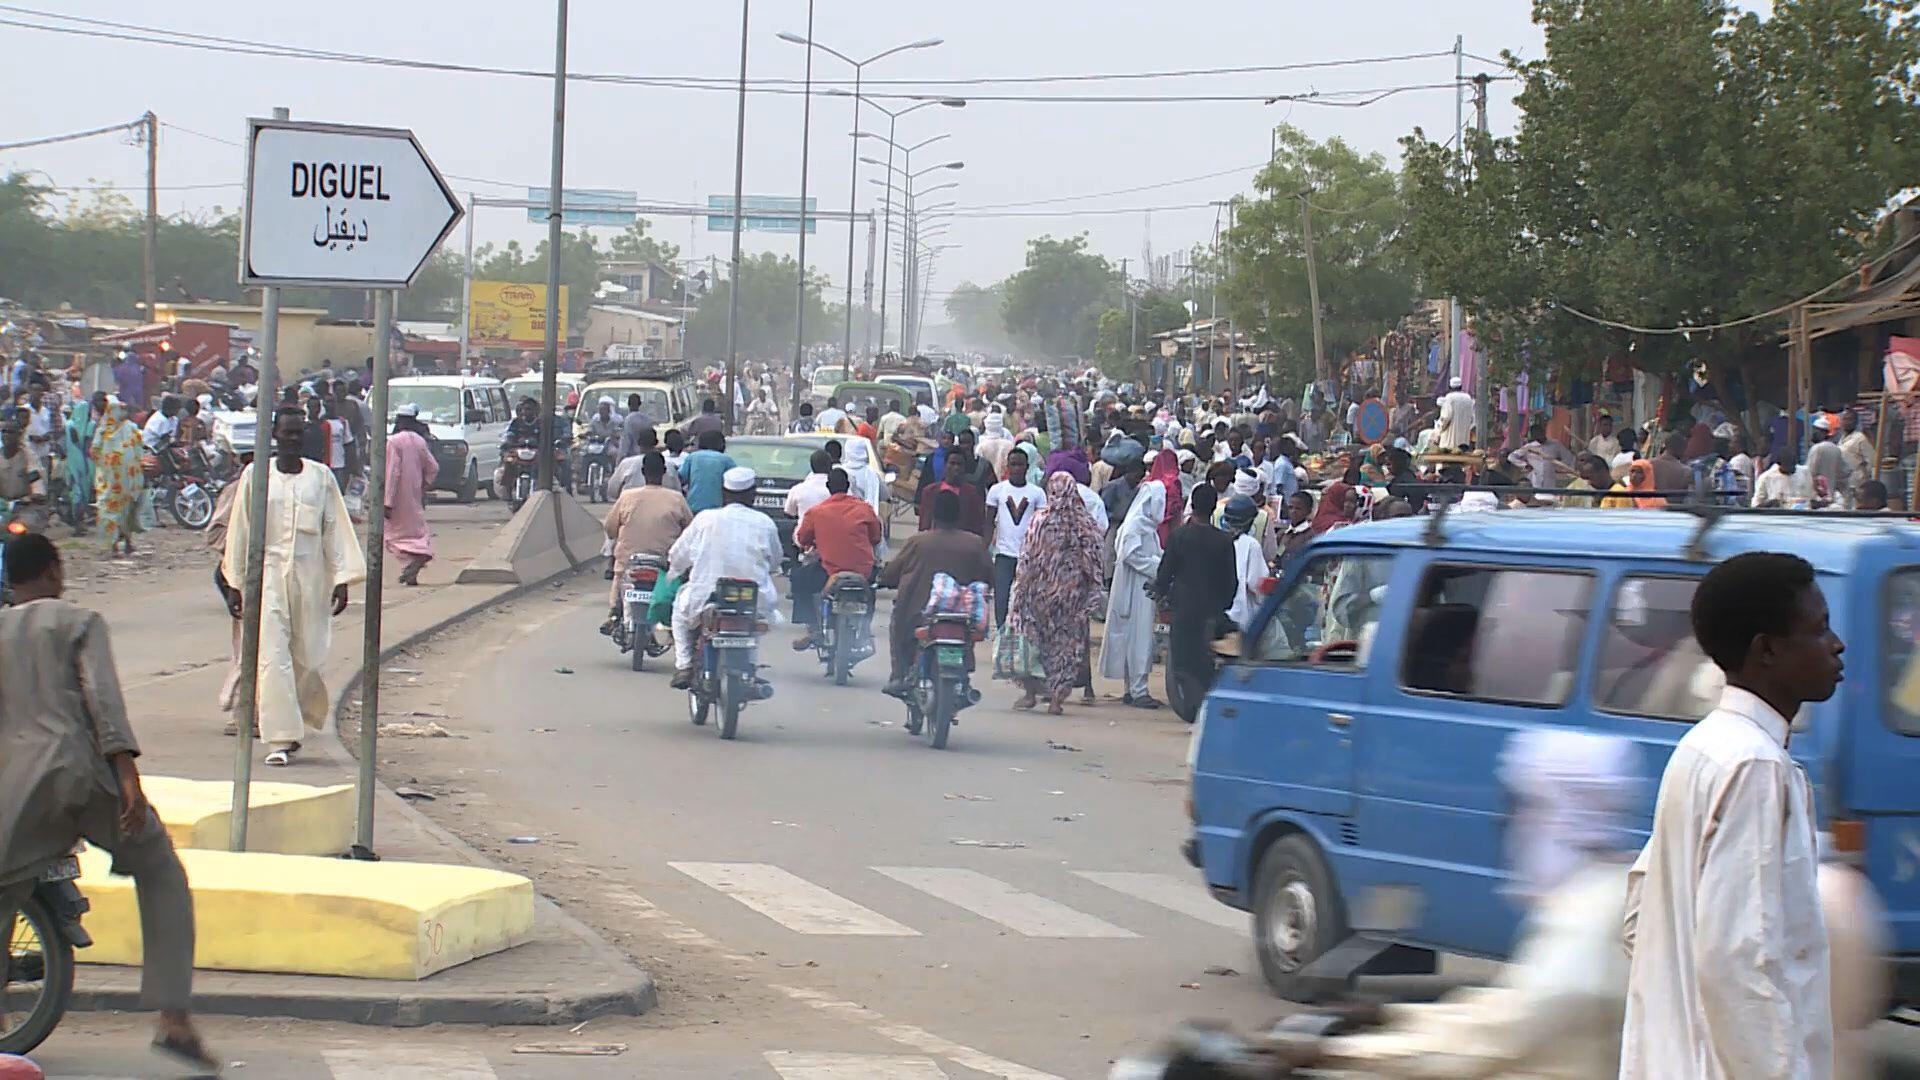 Un quartier de Ndjamena, la capitale du Tchad (image d'illustration)